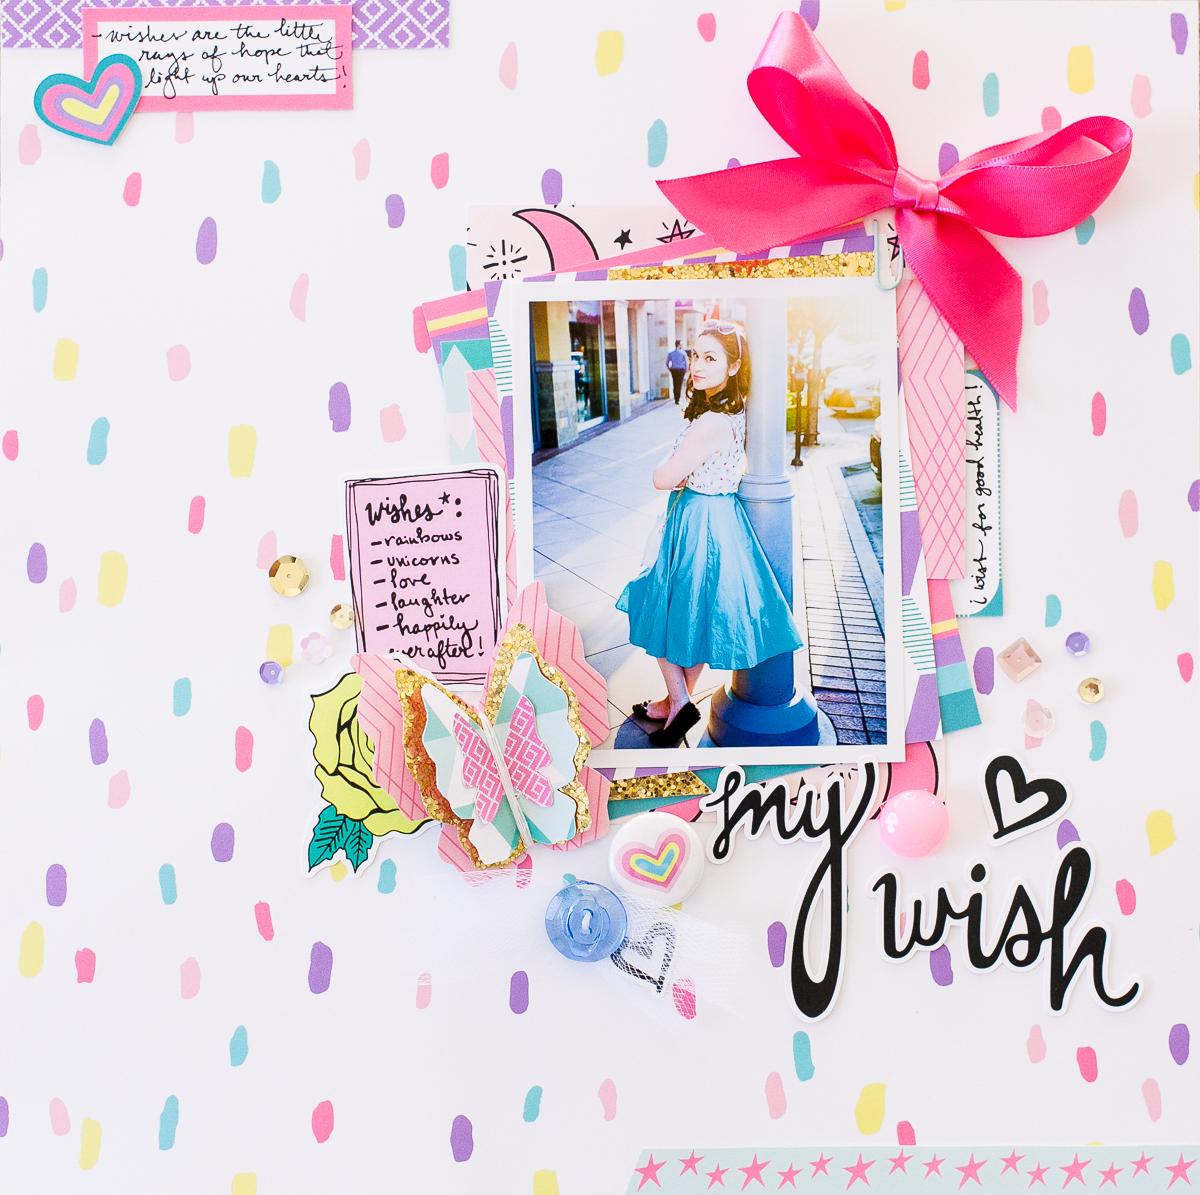 01-My-Wish-Everyday-Wishes-LO-2017-01-13.jpg